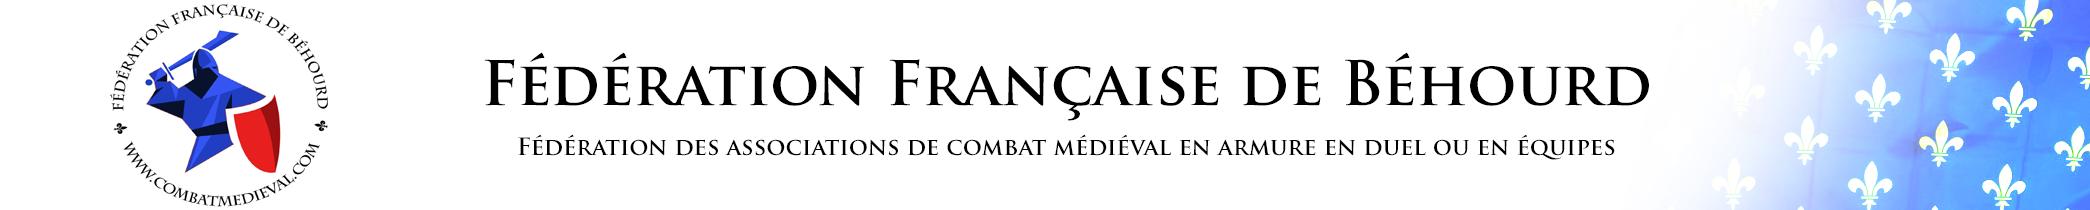 Fédération Française de Béhourd